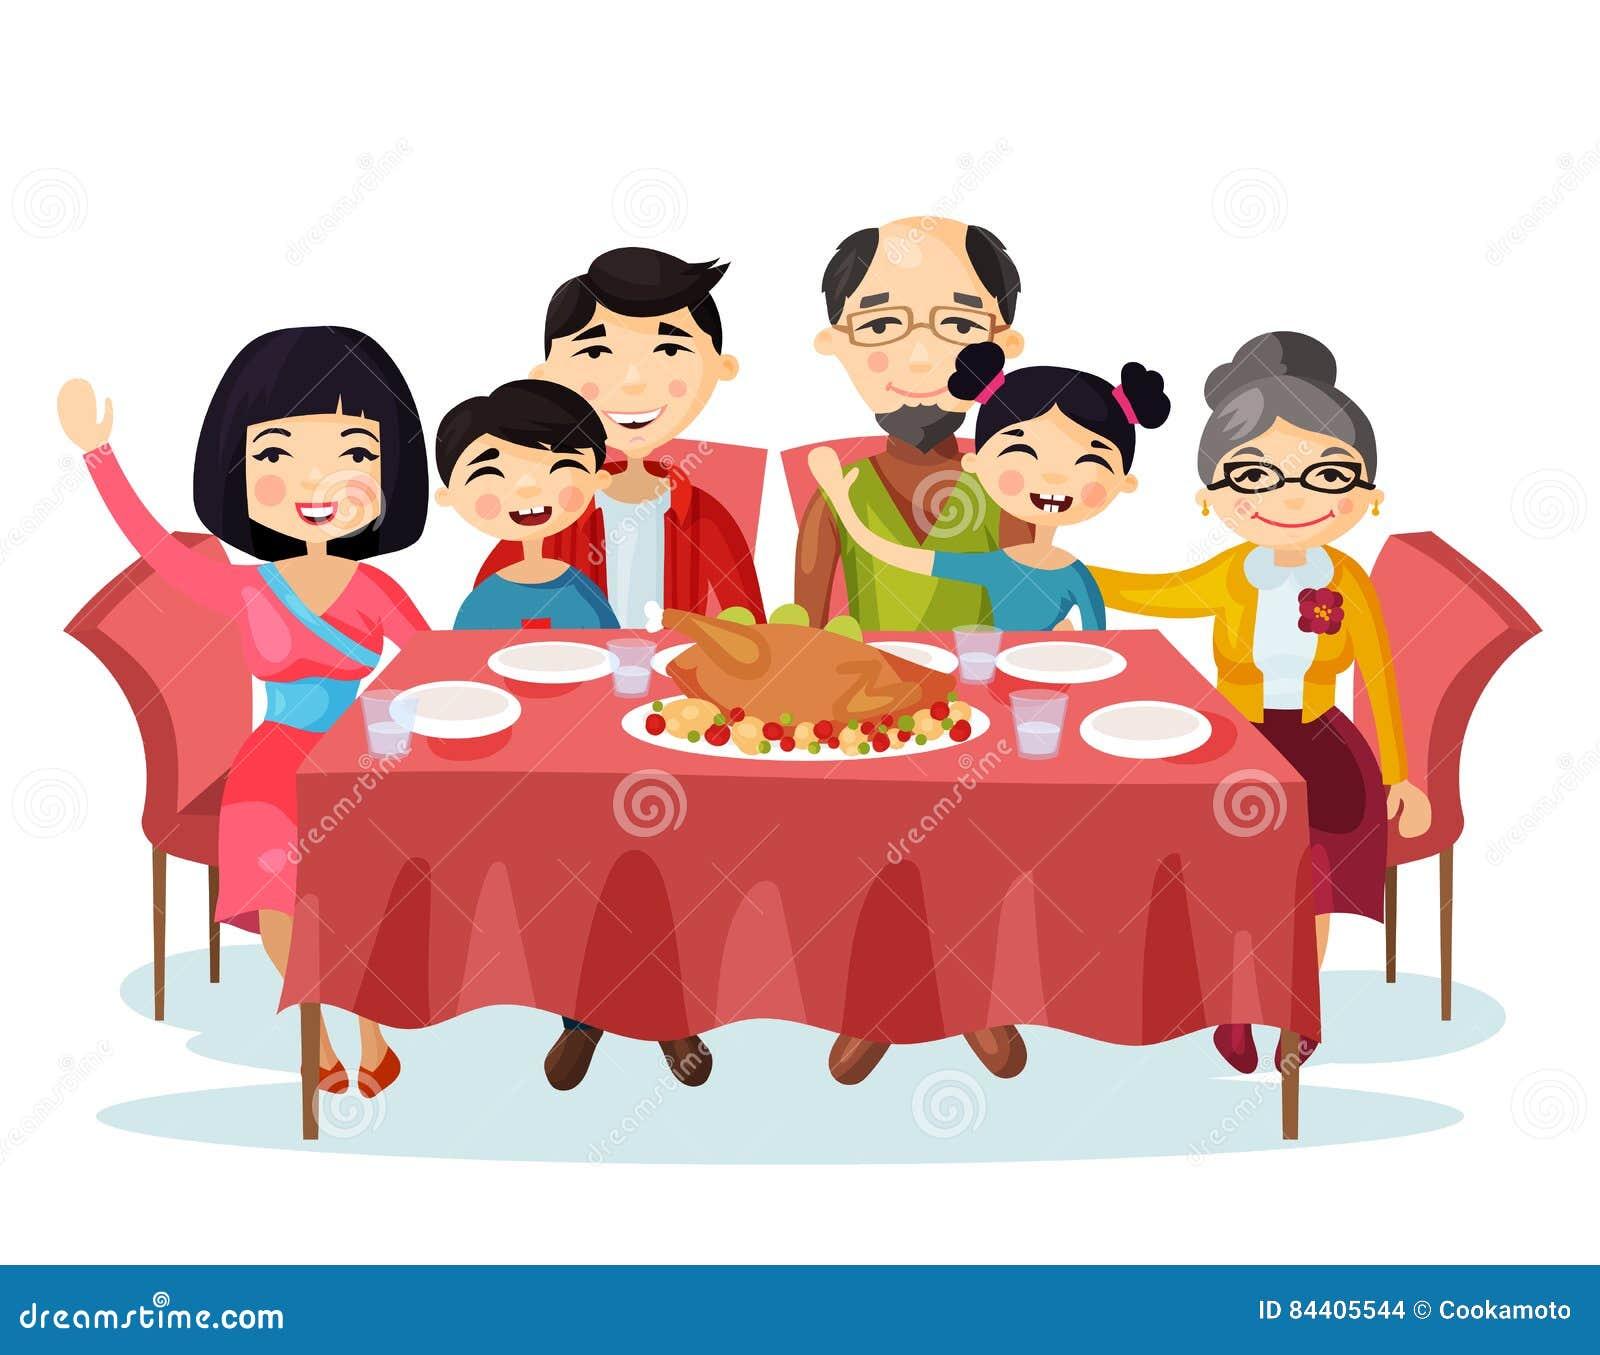 Eating Table Cartoon: Holiday Dinner With Turkey Of Cartoon Family Stock Vector